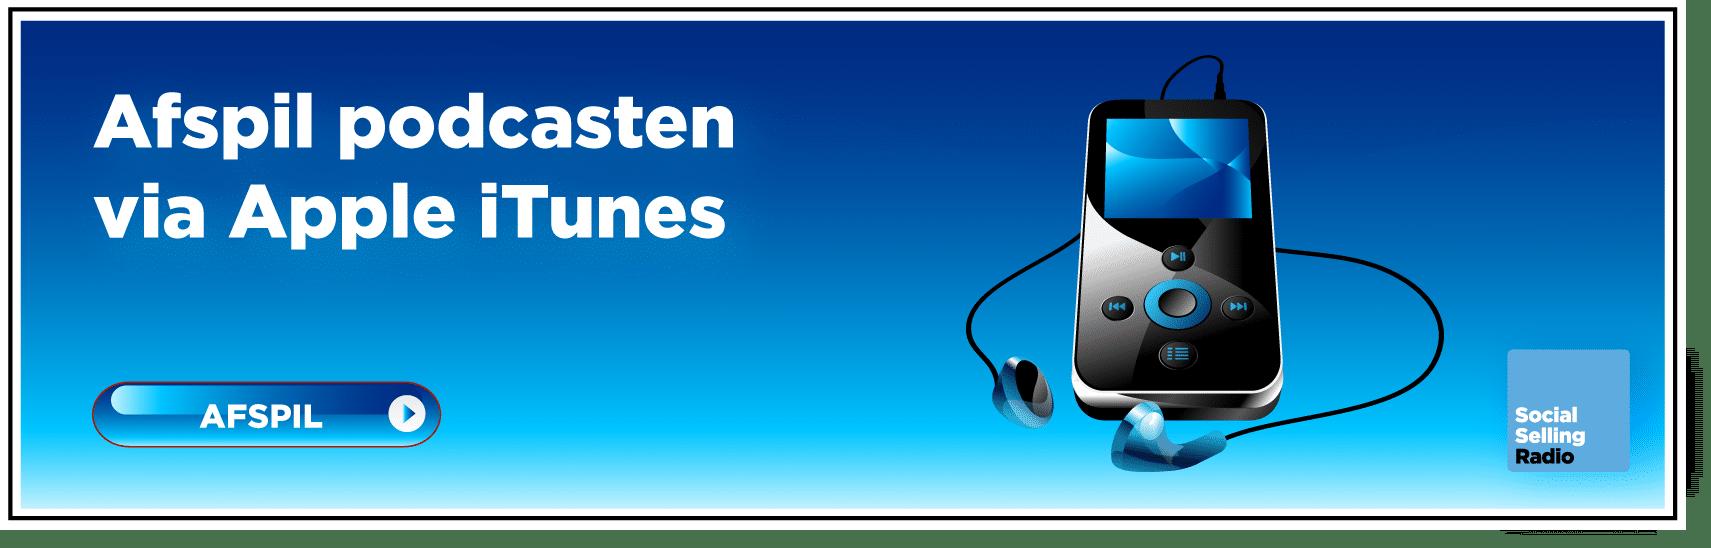 Afspil podcasteb via iTunes